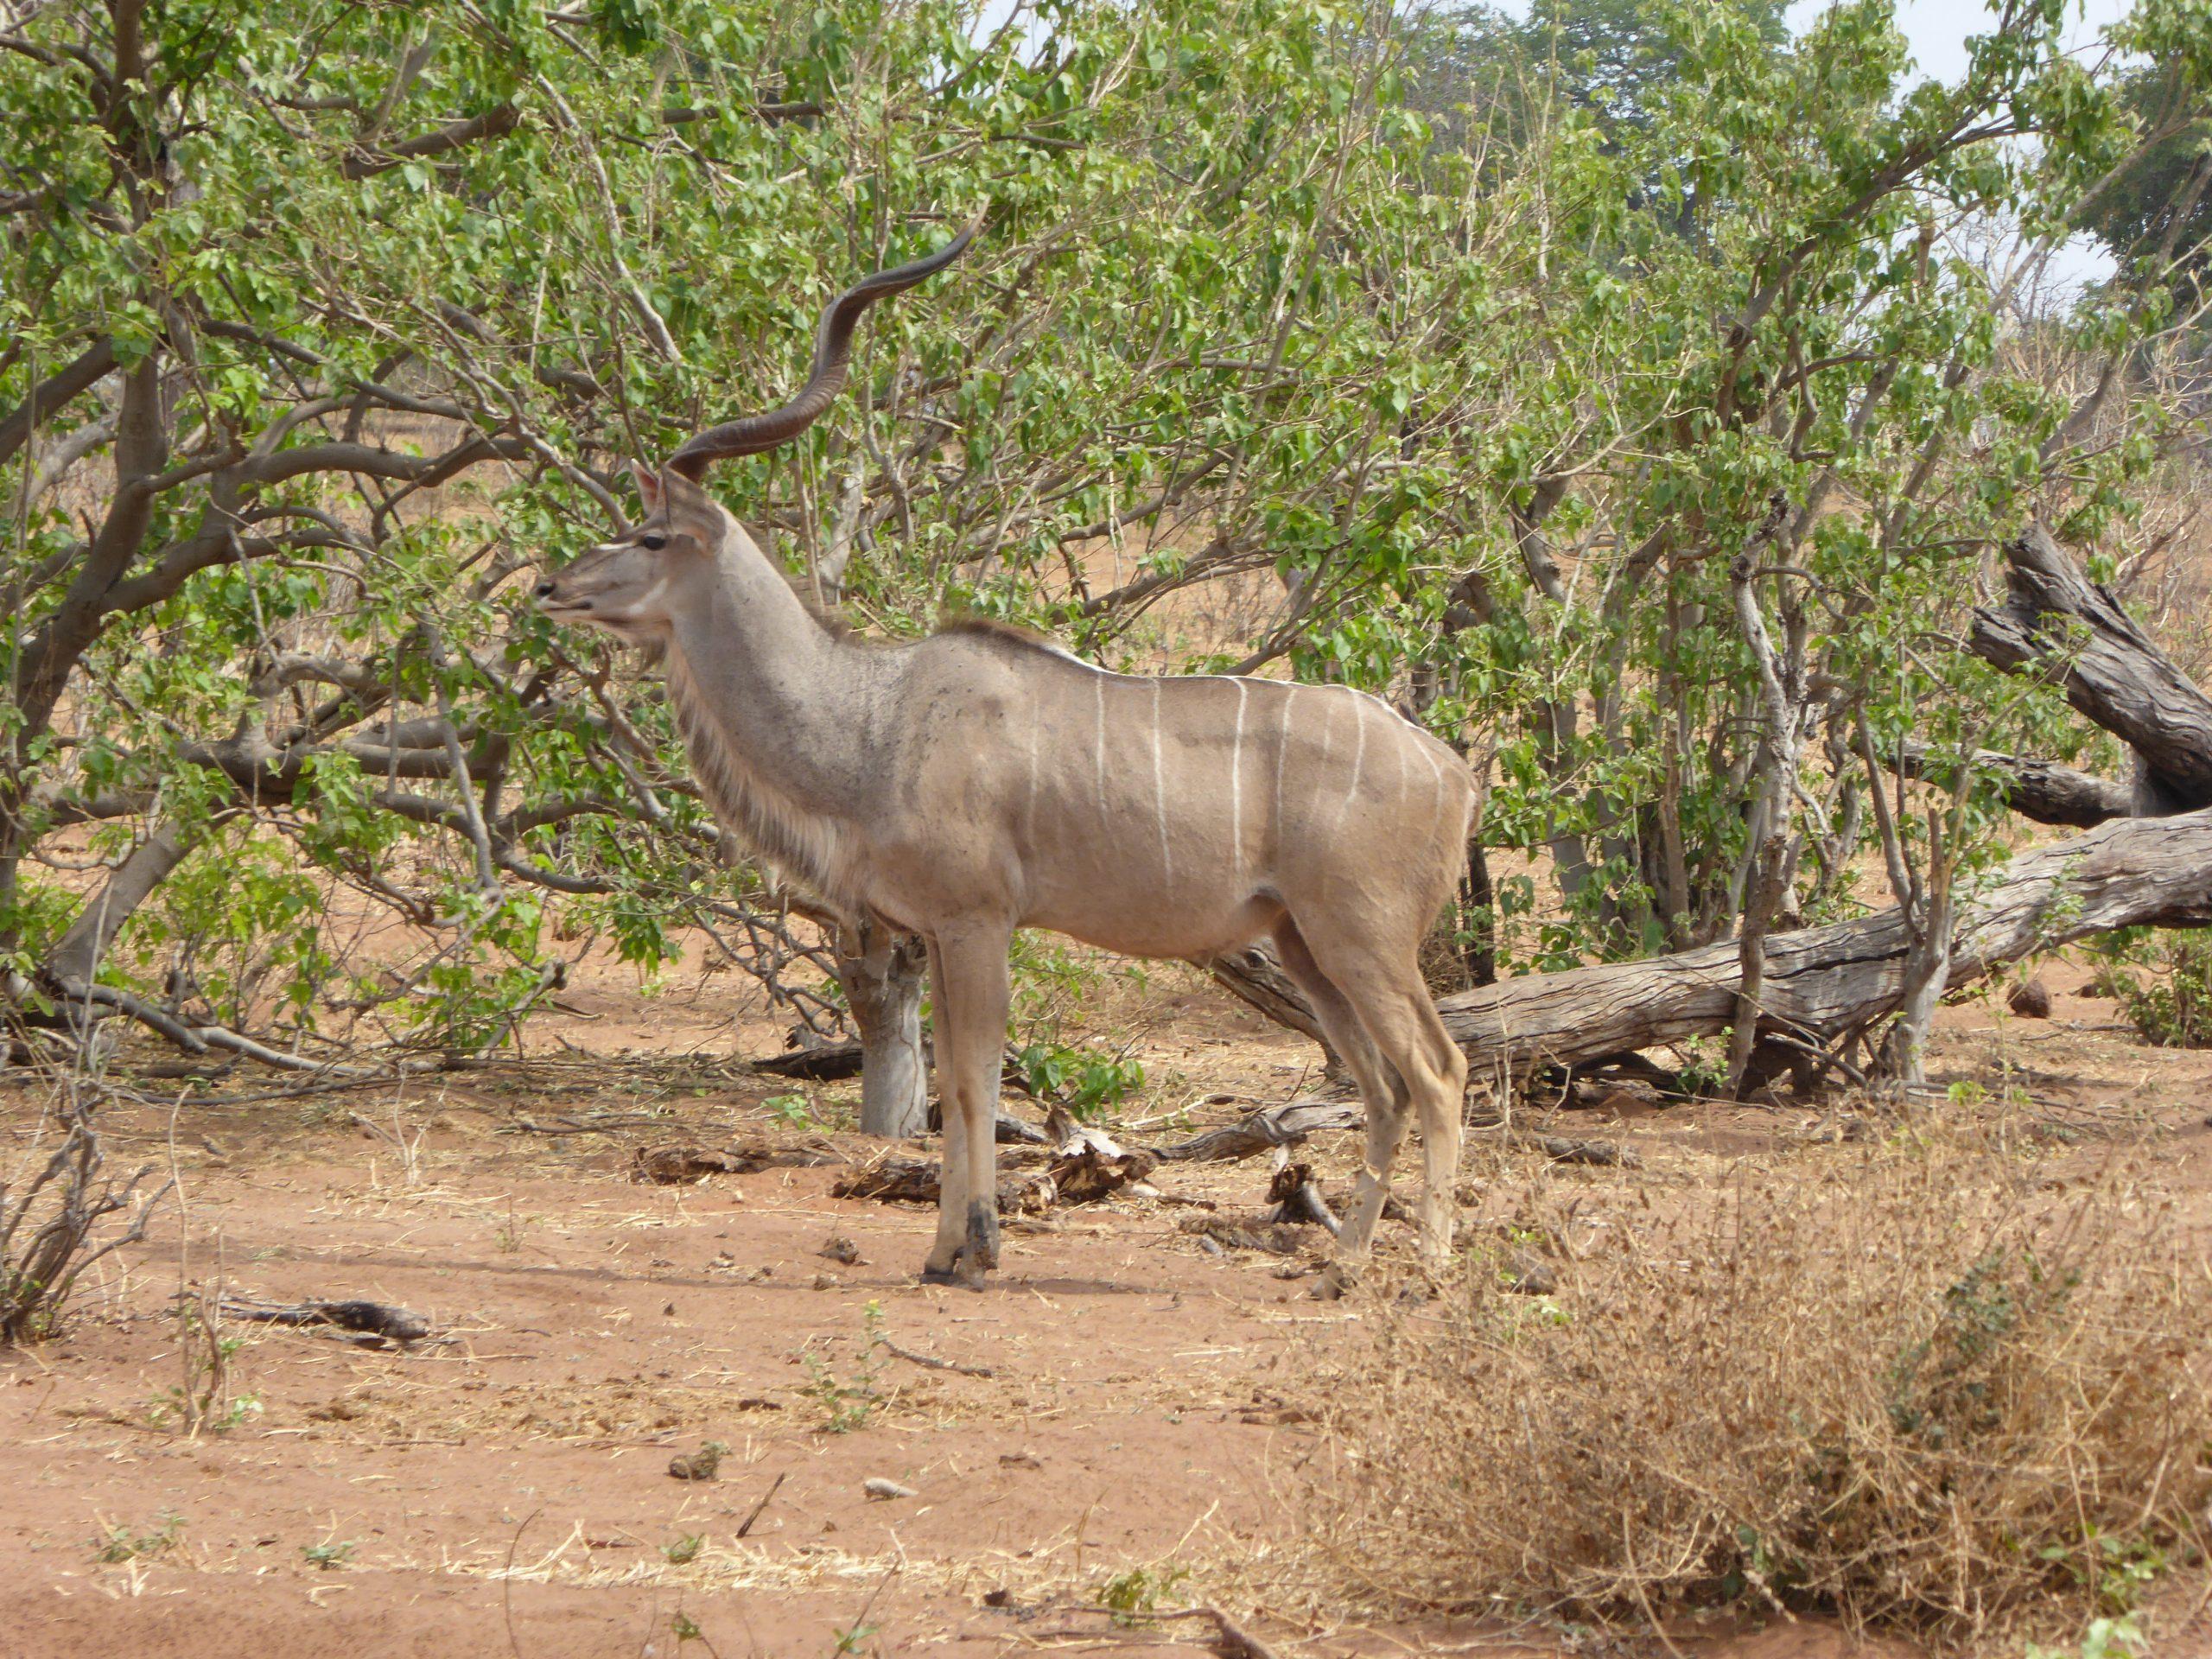 Radreise Afrika 2014 - Chobe NP - Großer Kudu